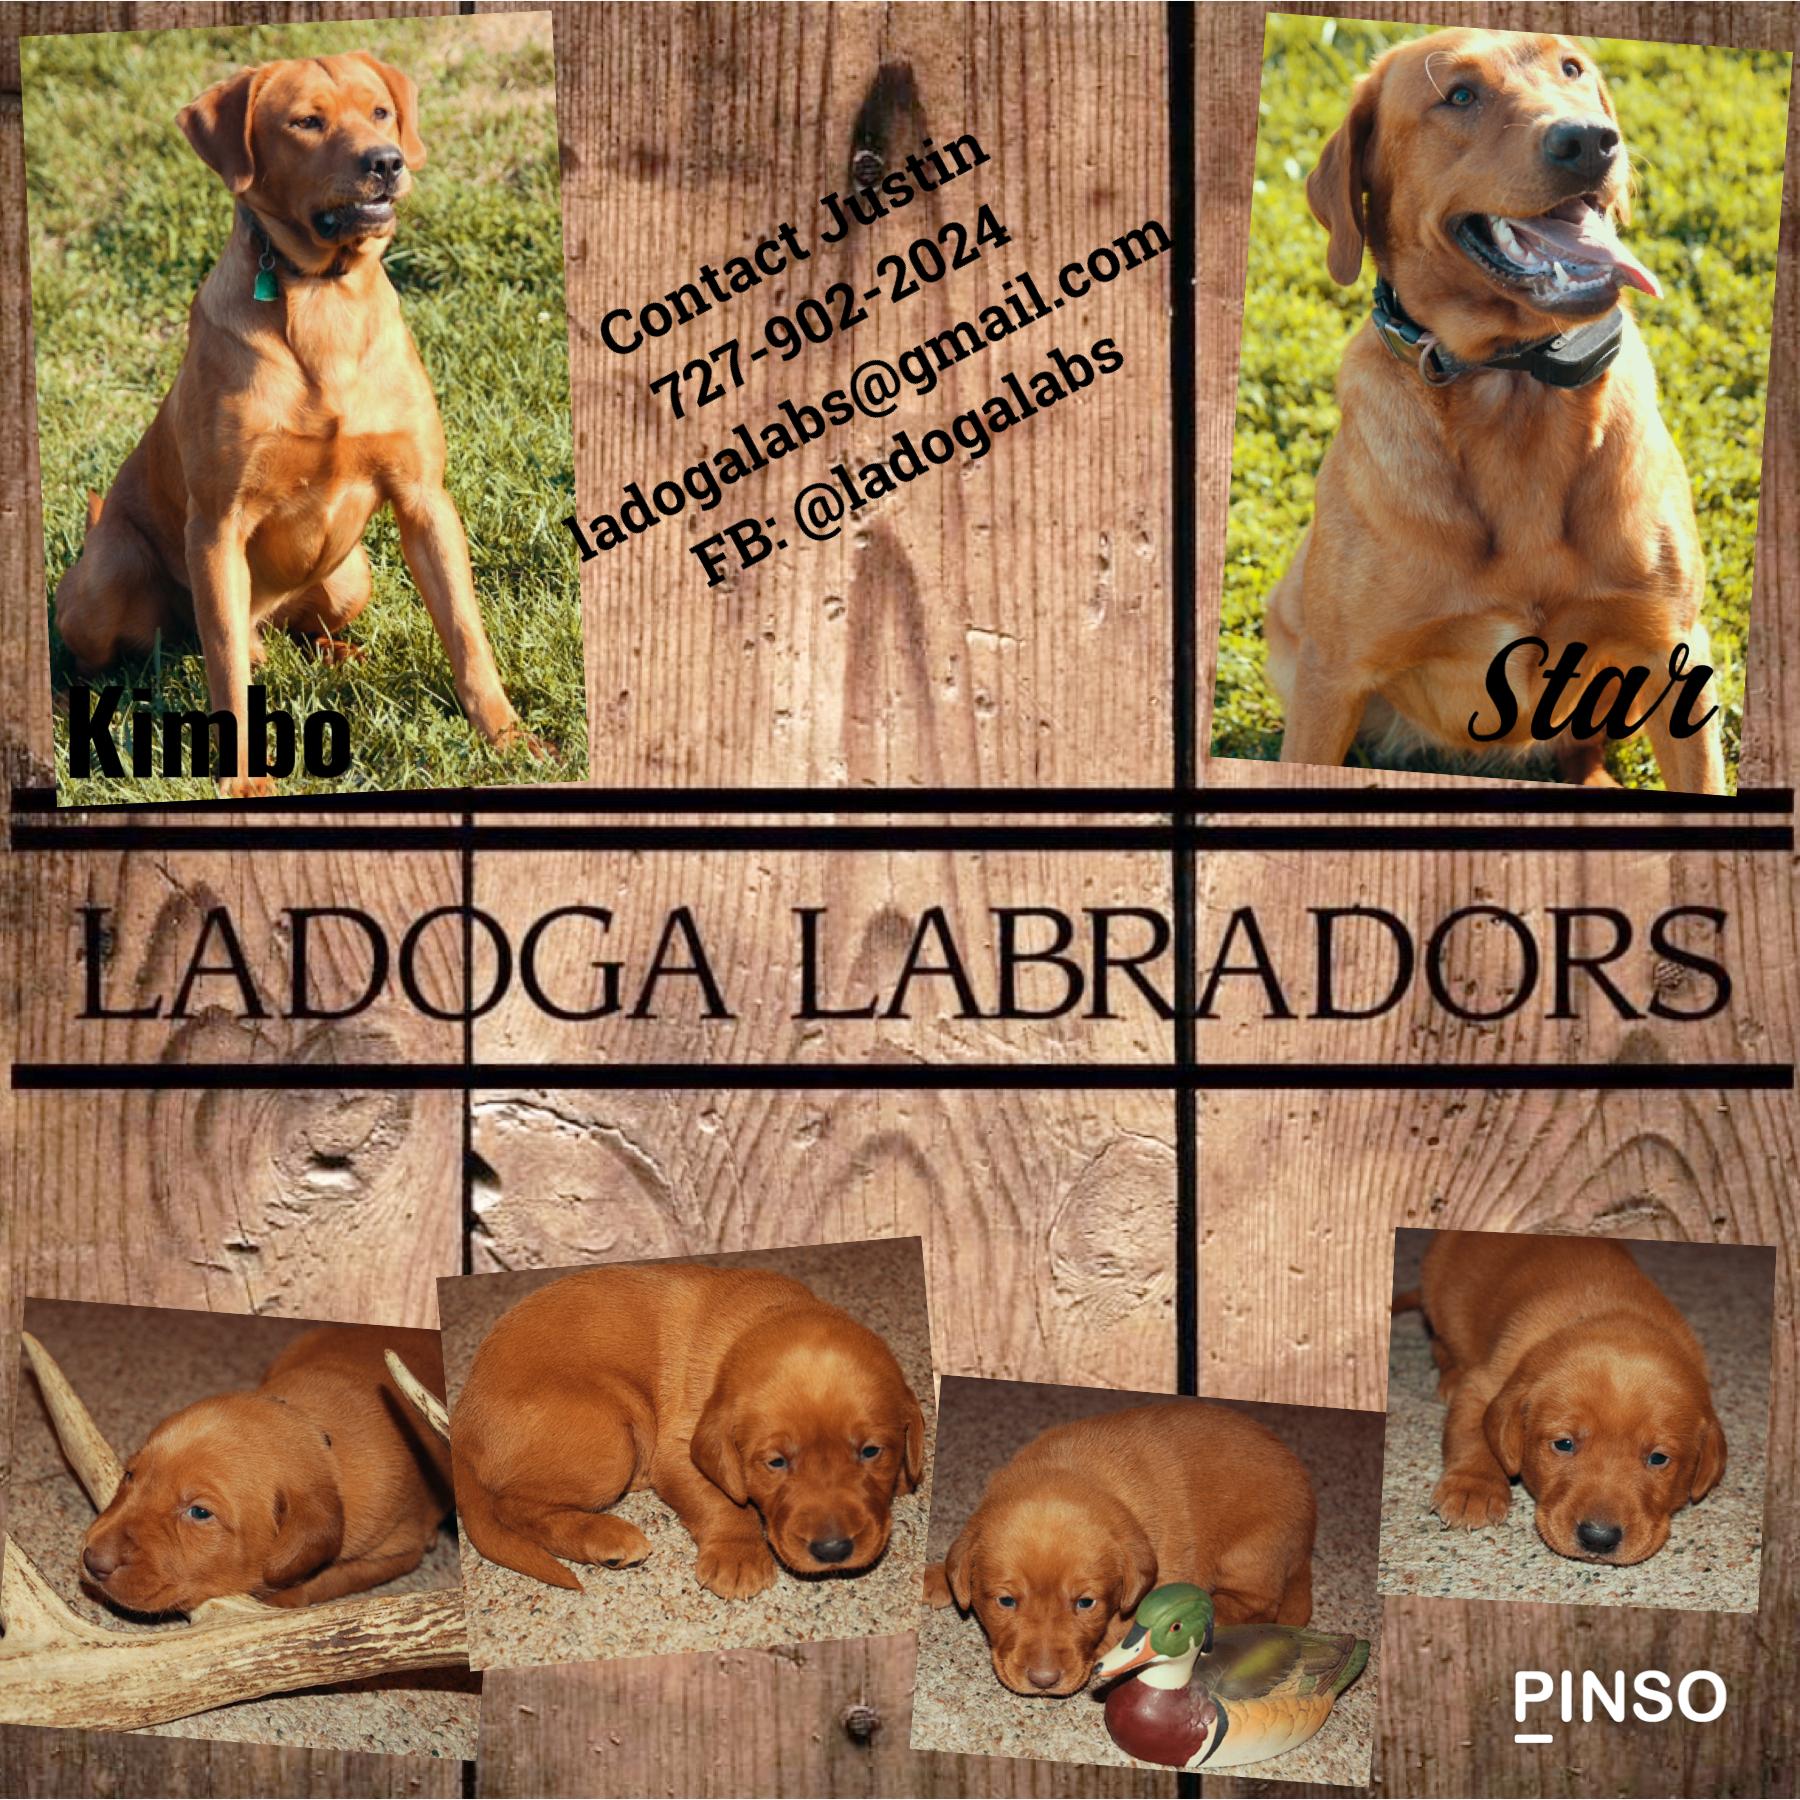 Red Labradors image 1